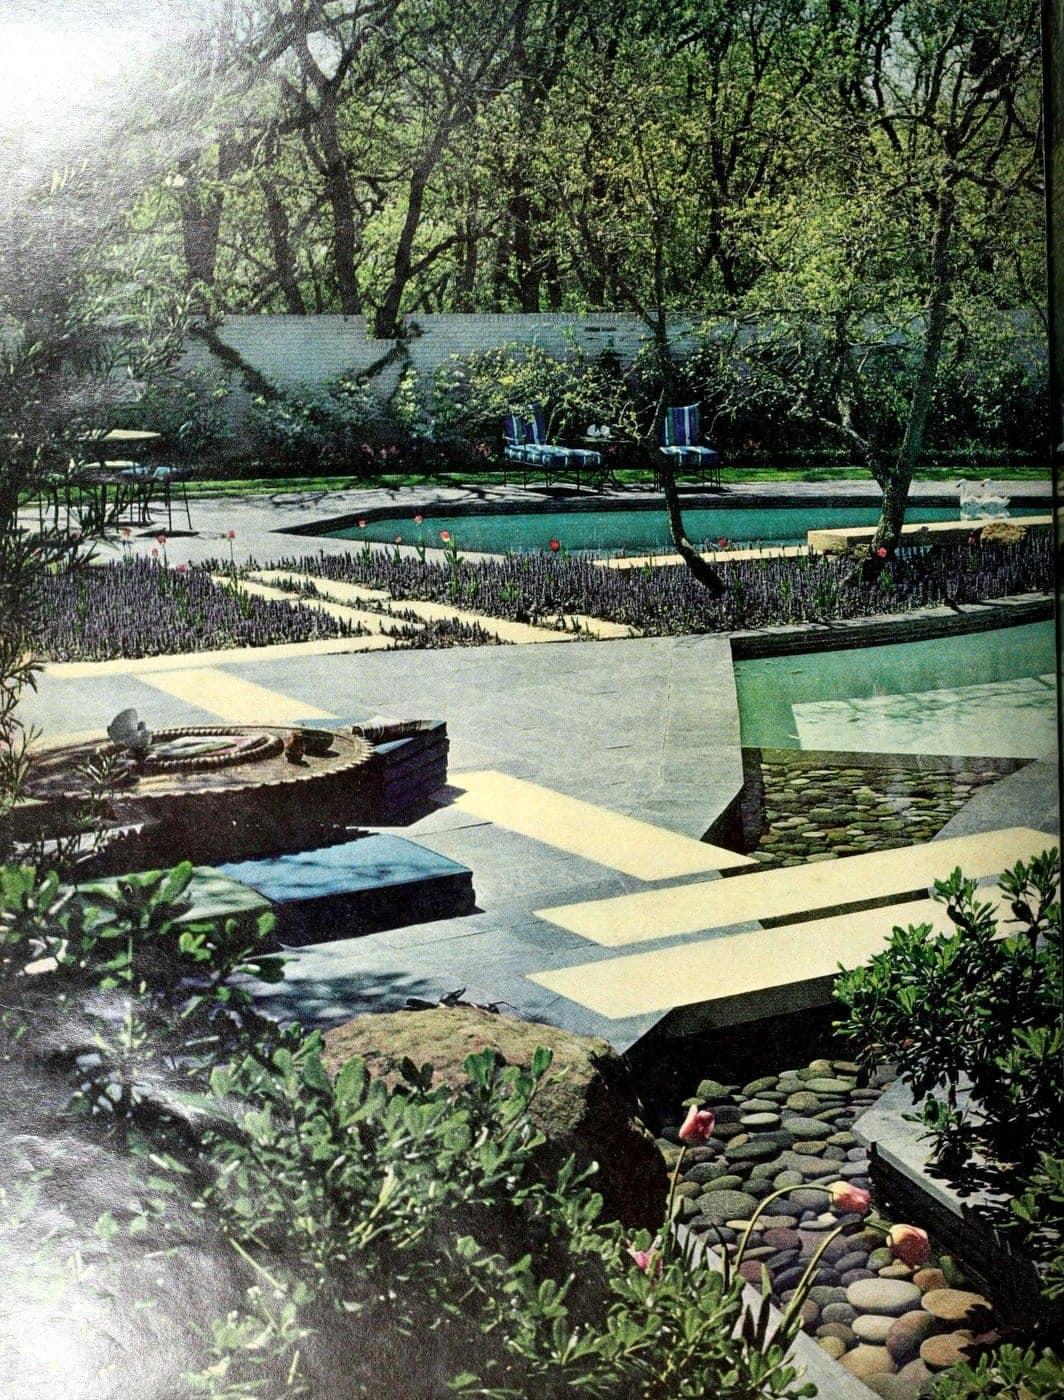 Classic backyard swimming pool design from 1963 (1)